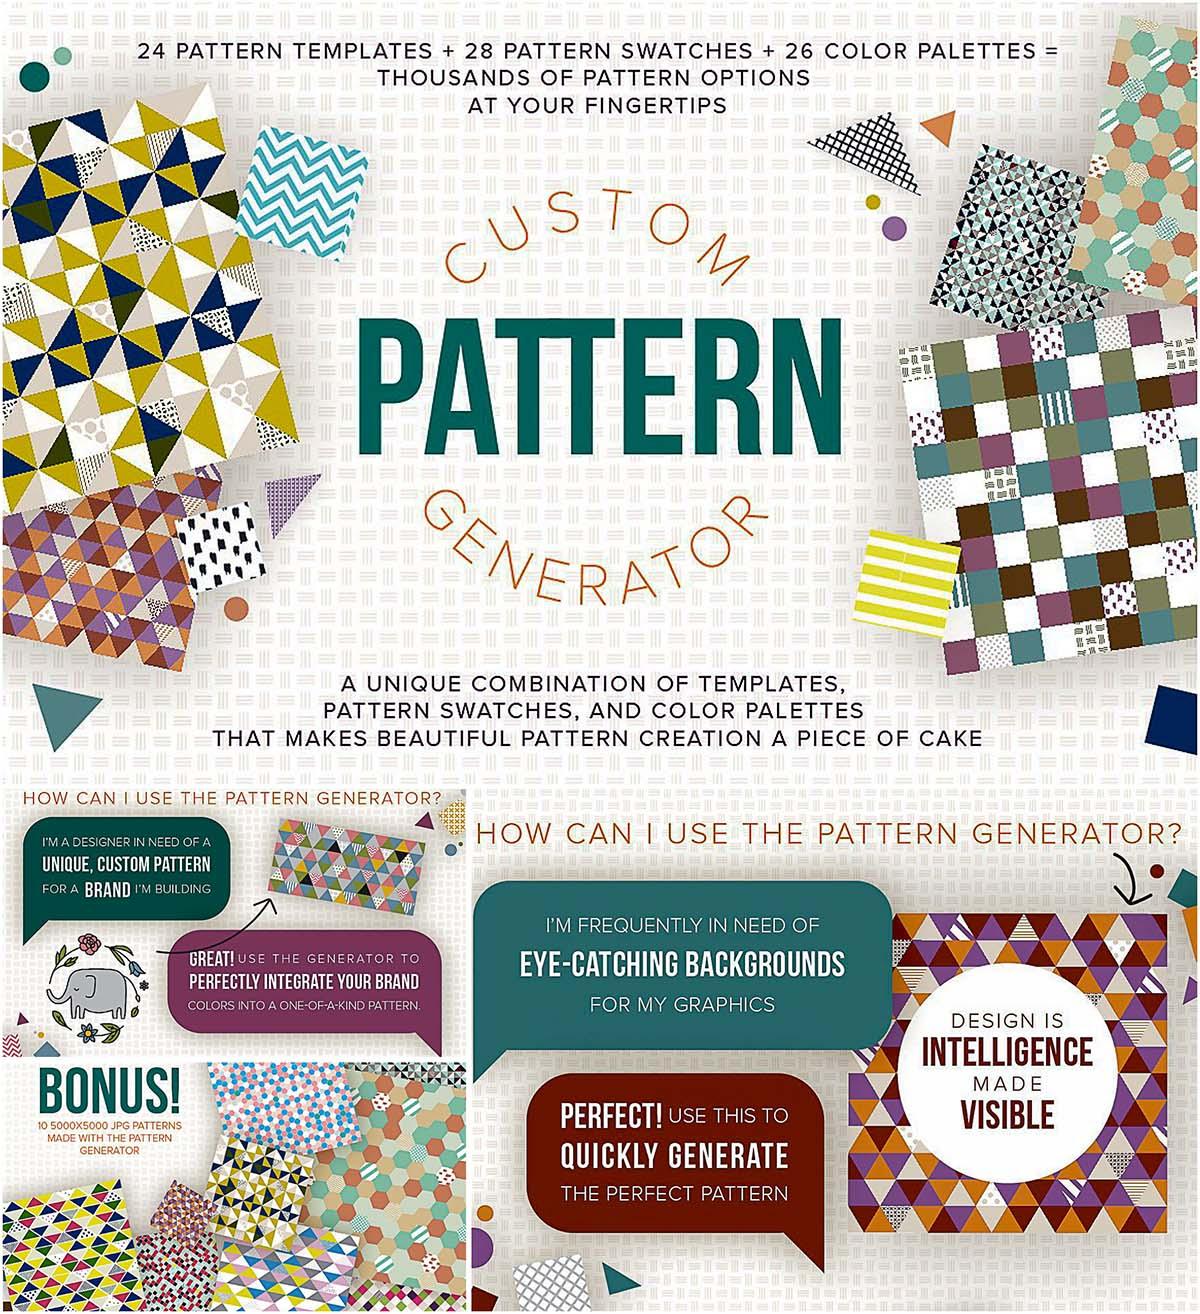 Custom pattern creator